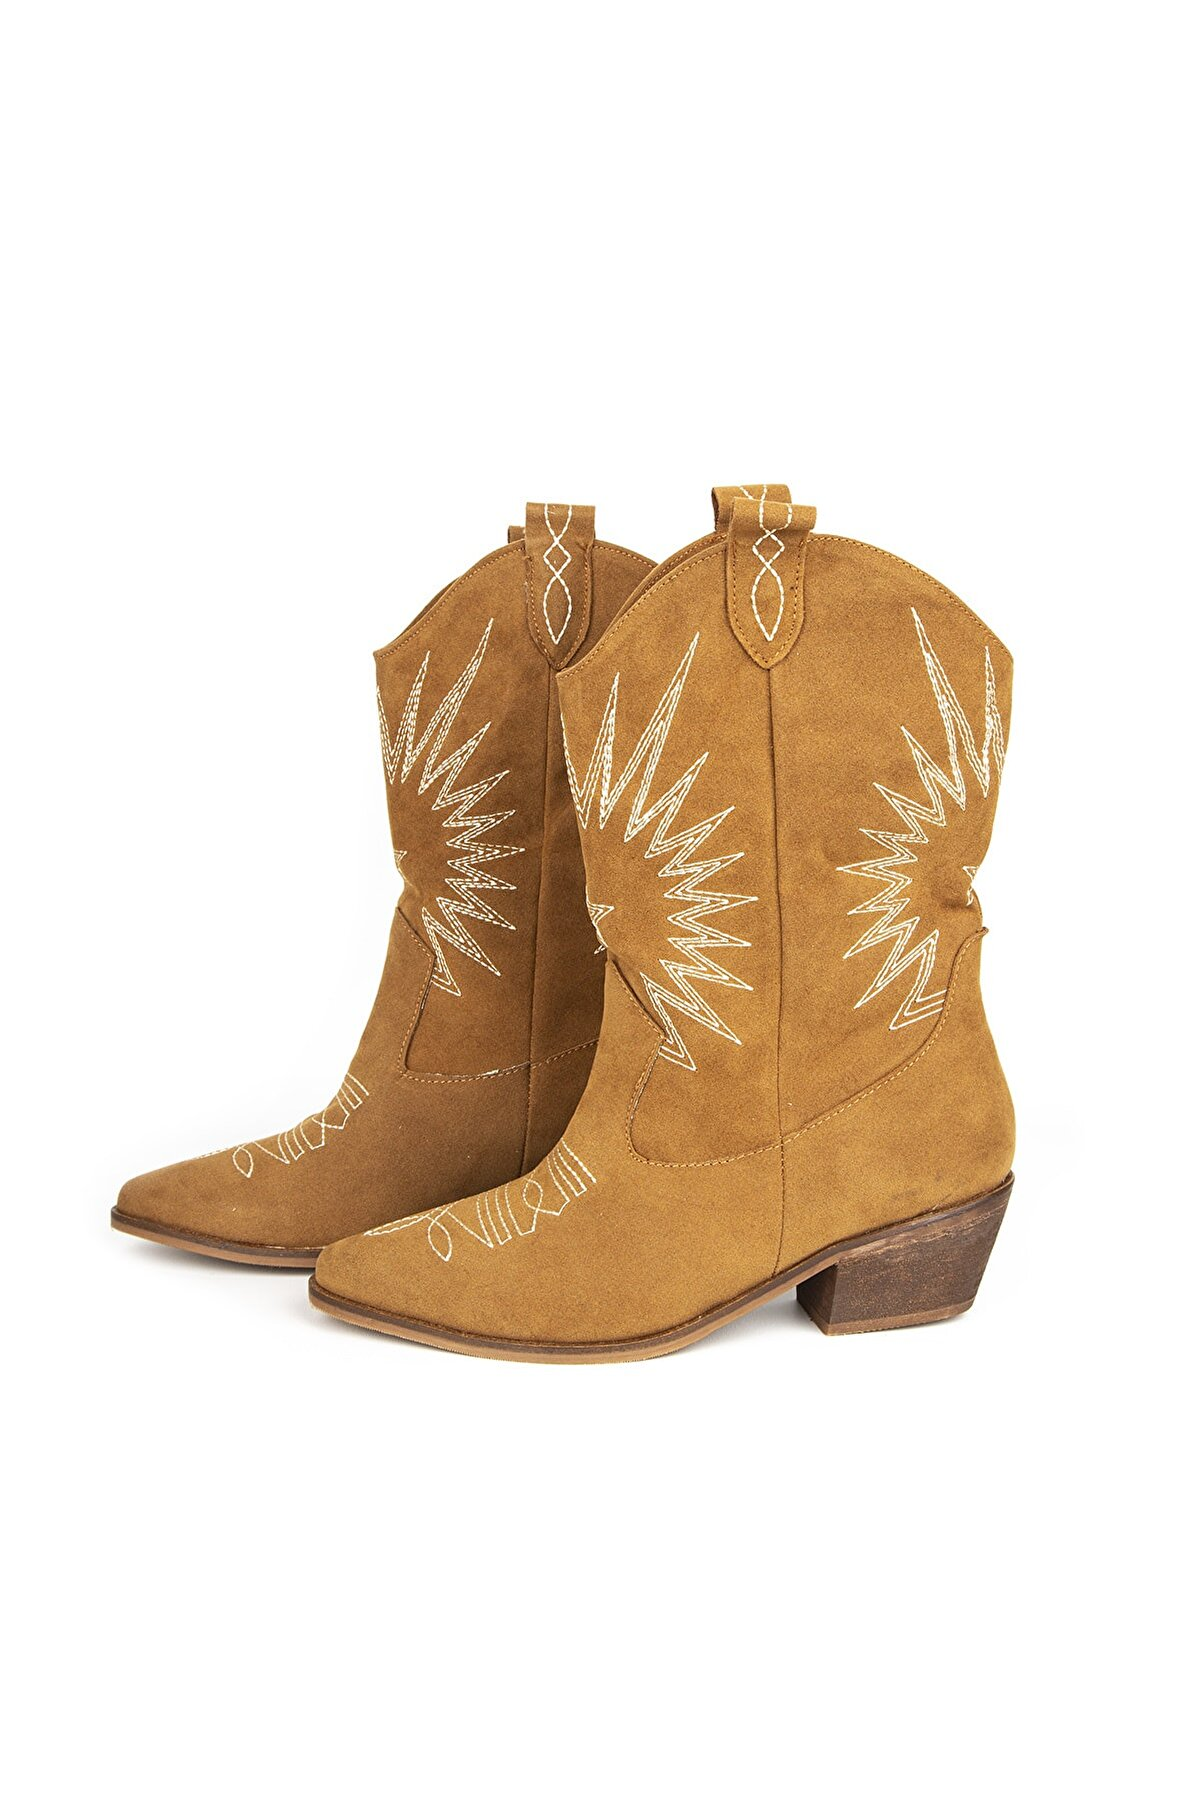 Zeynep Yiğit Shoes Kadın Taba Kovboy Çizme